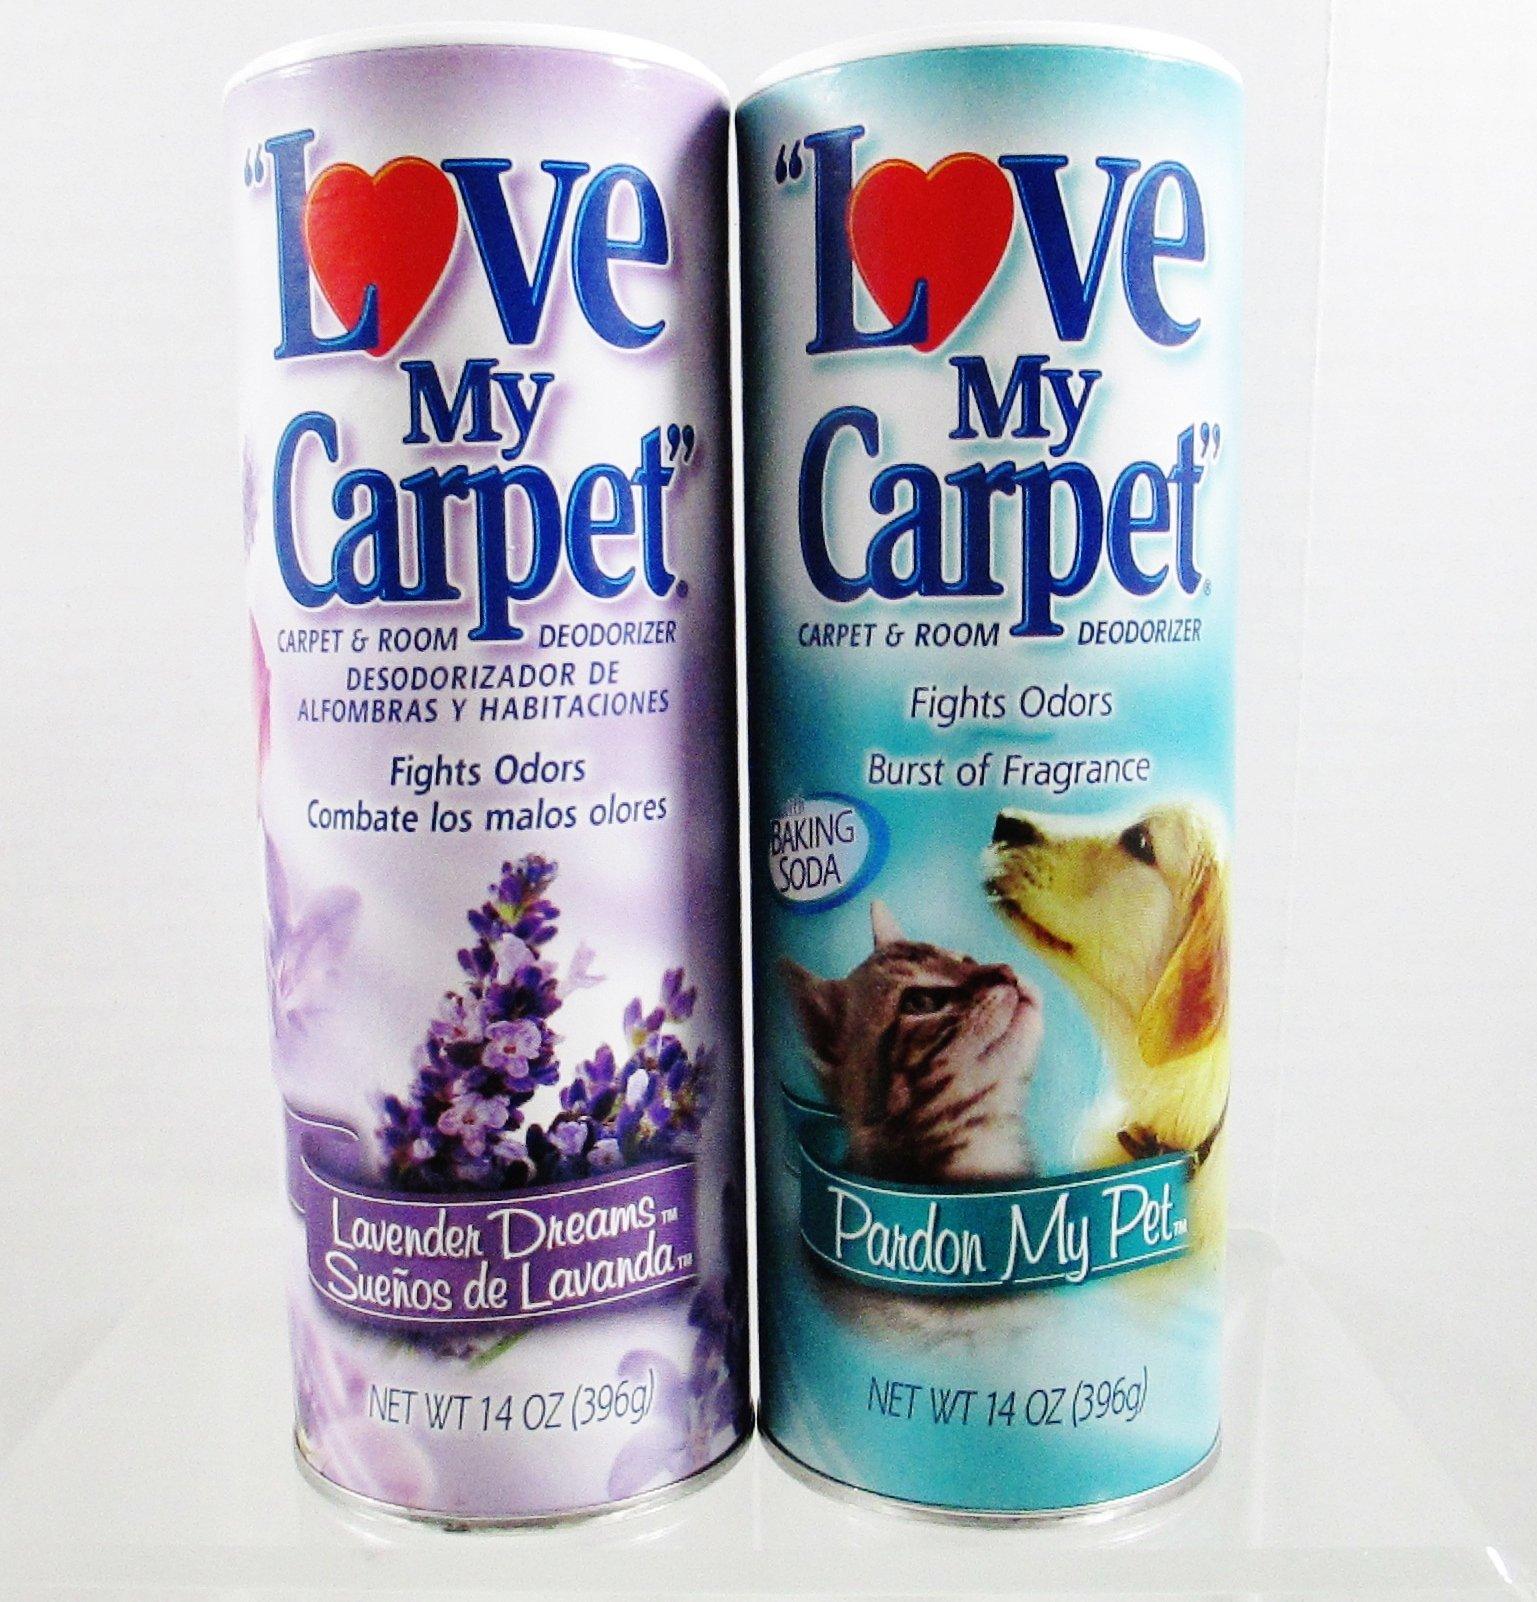 Love My Carpet Carpet & Room Deodorizer - 2 Pack - Lavender Dreams & Pardon My Pet